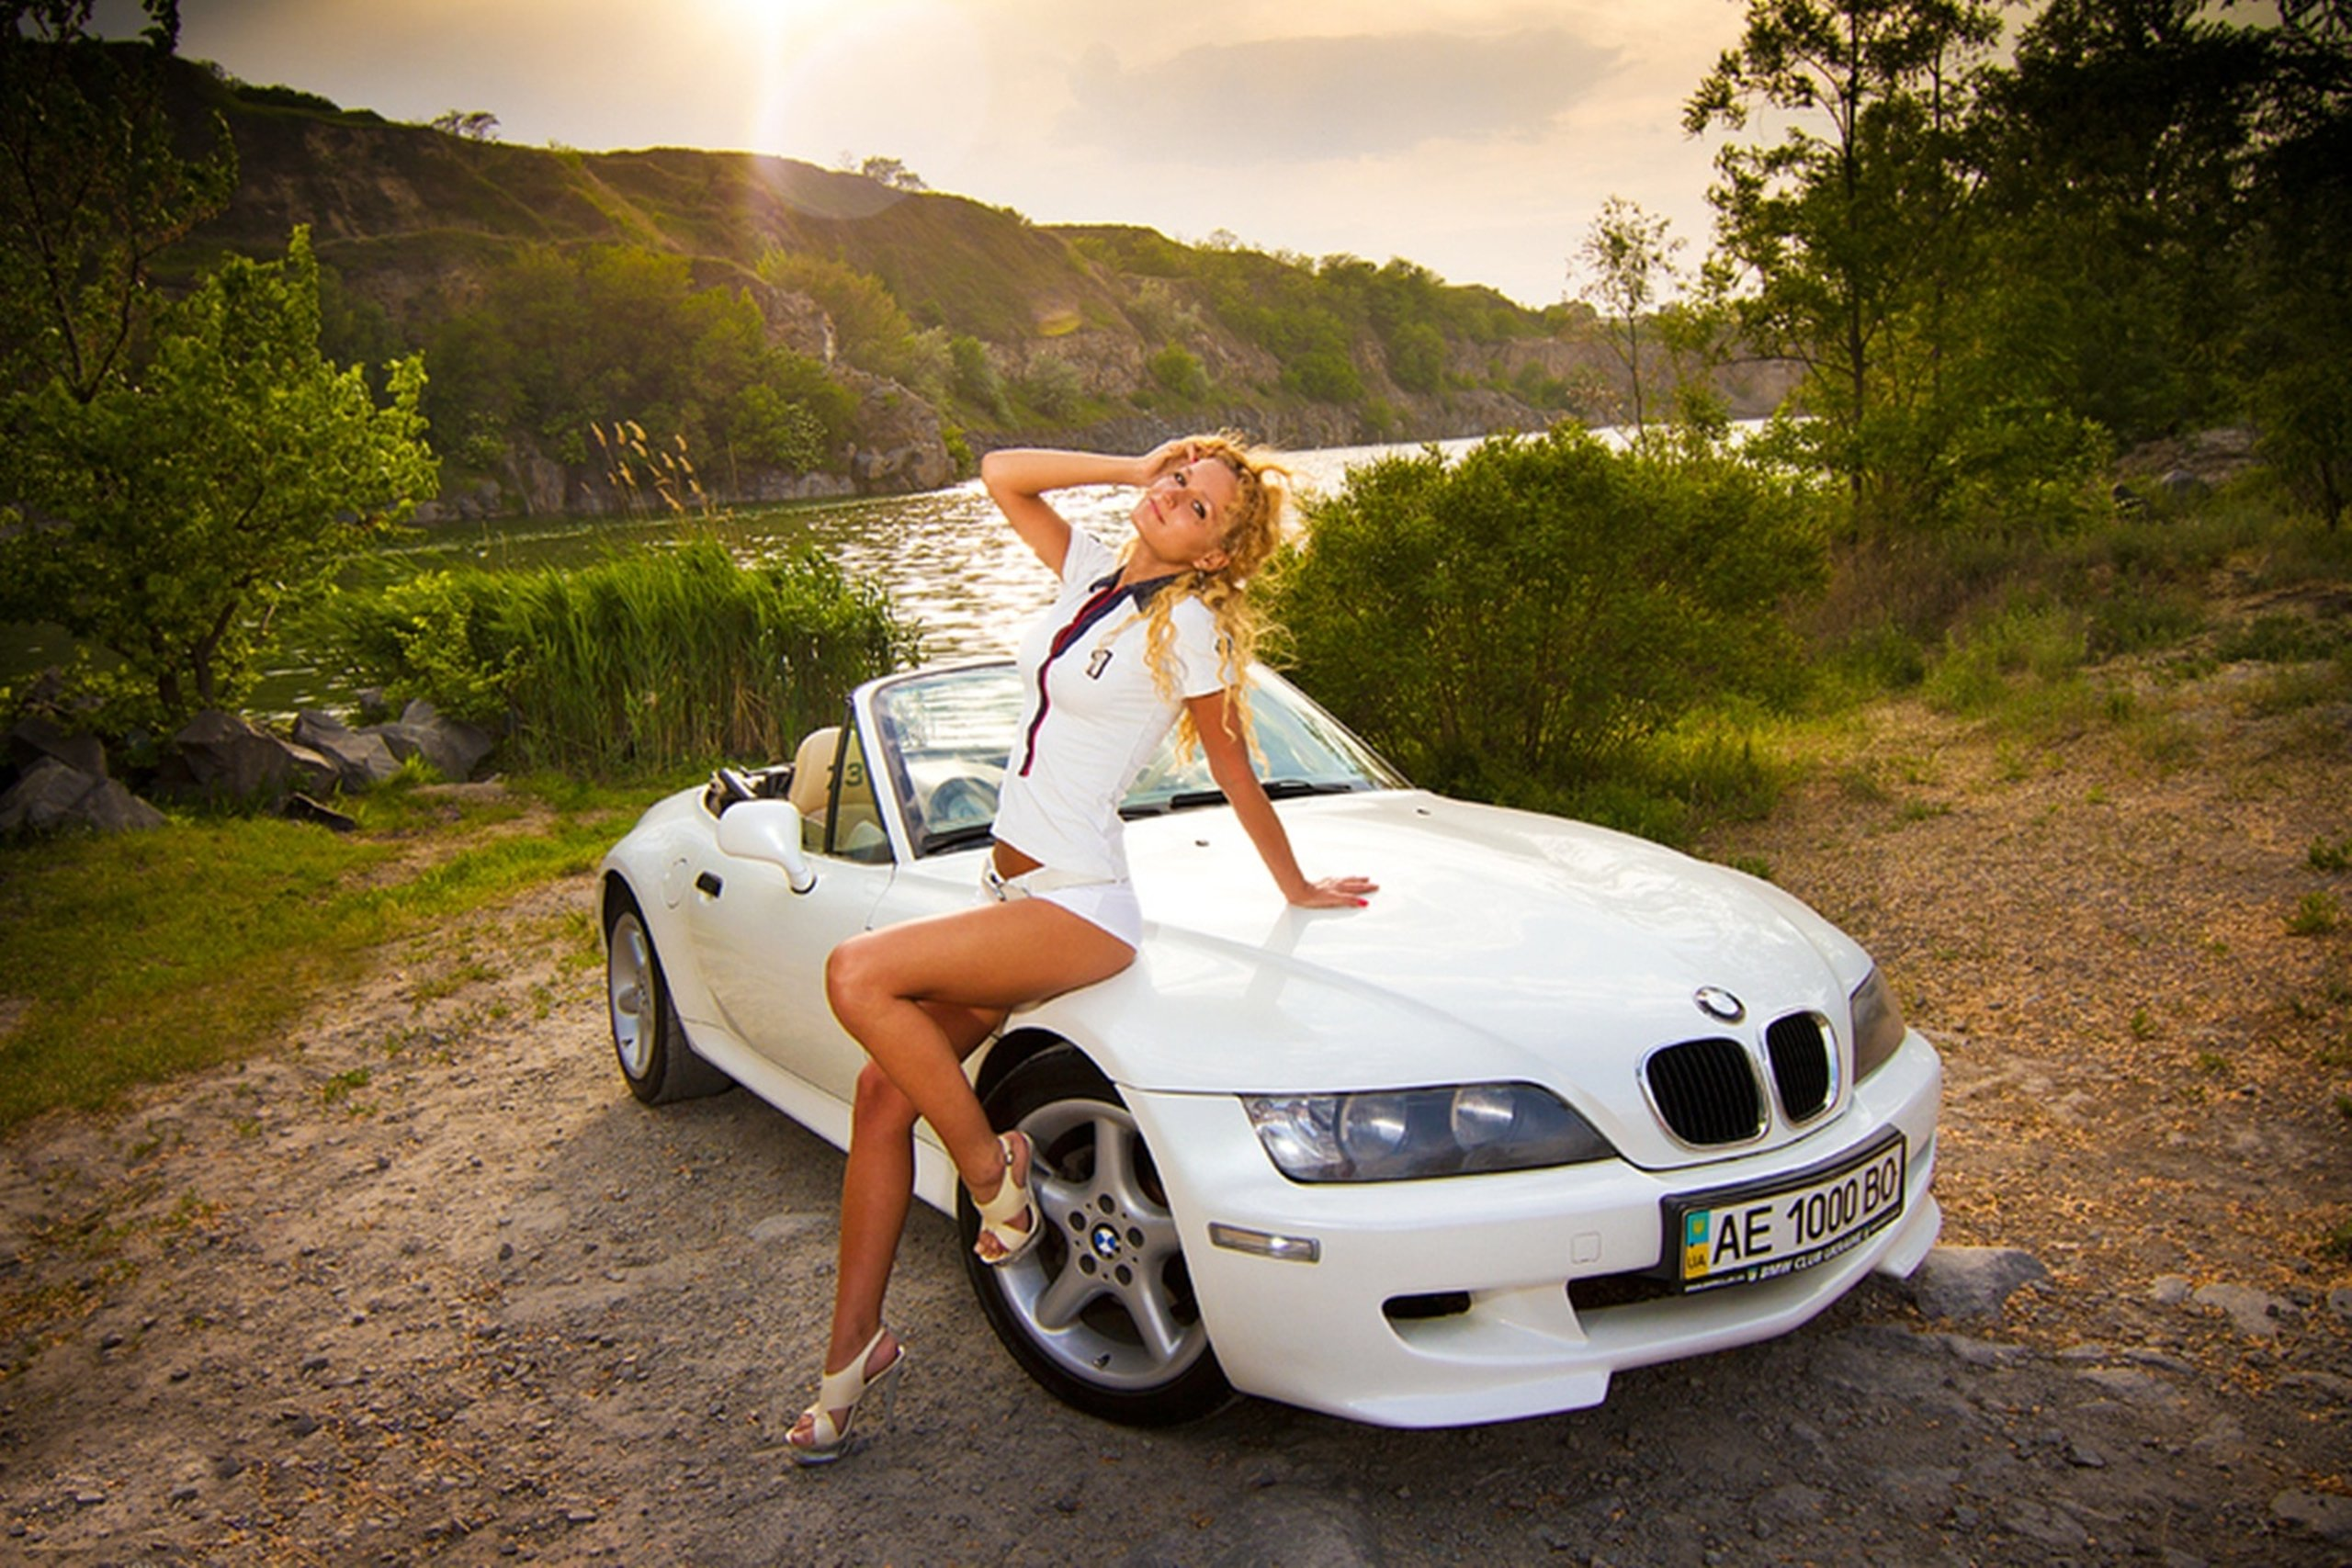 Bmw Z3 Blonde Cars Model Car Wallpaper 2560x1707